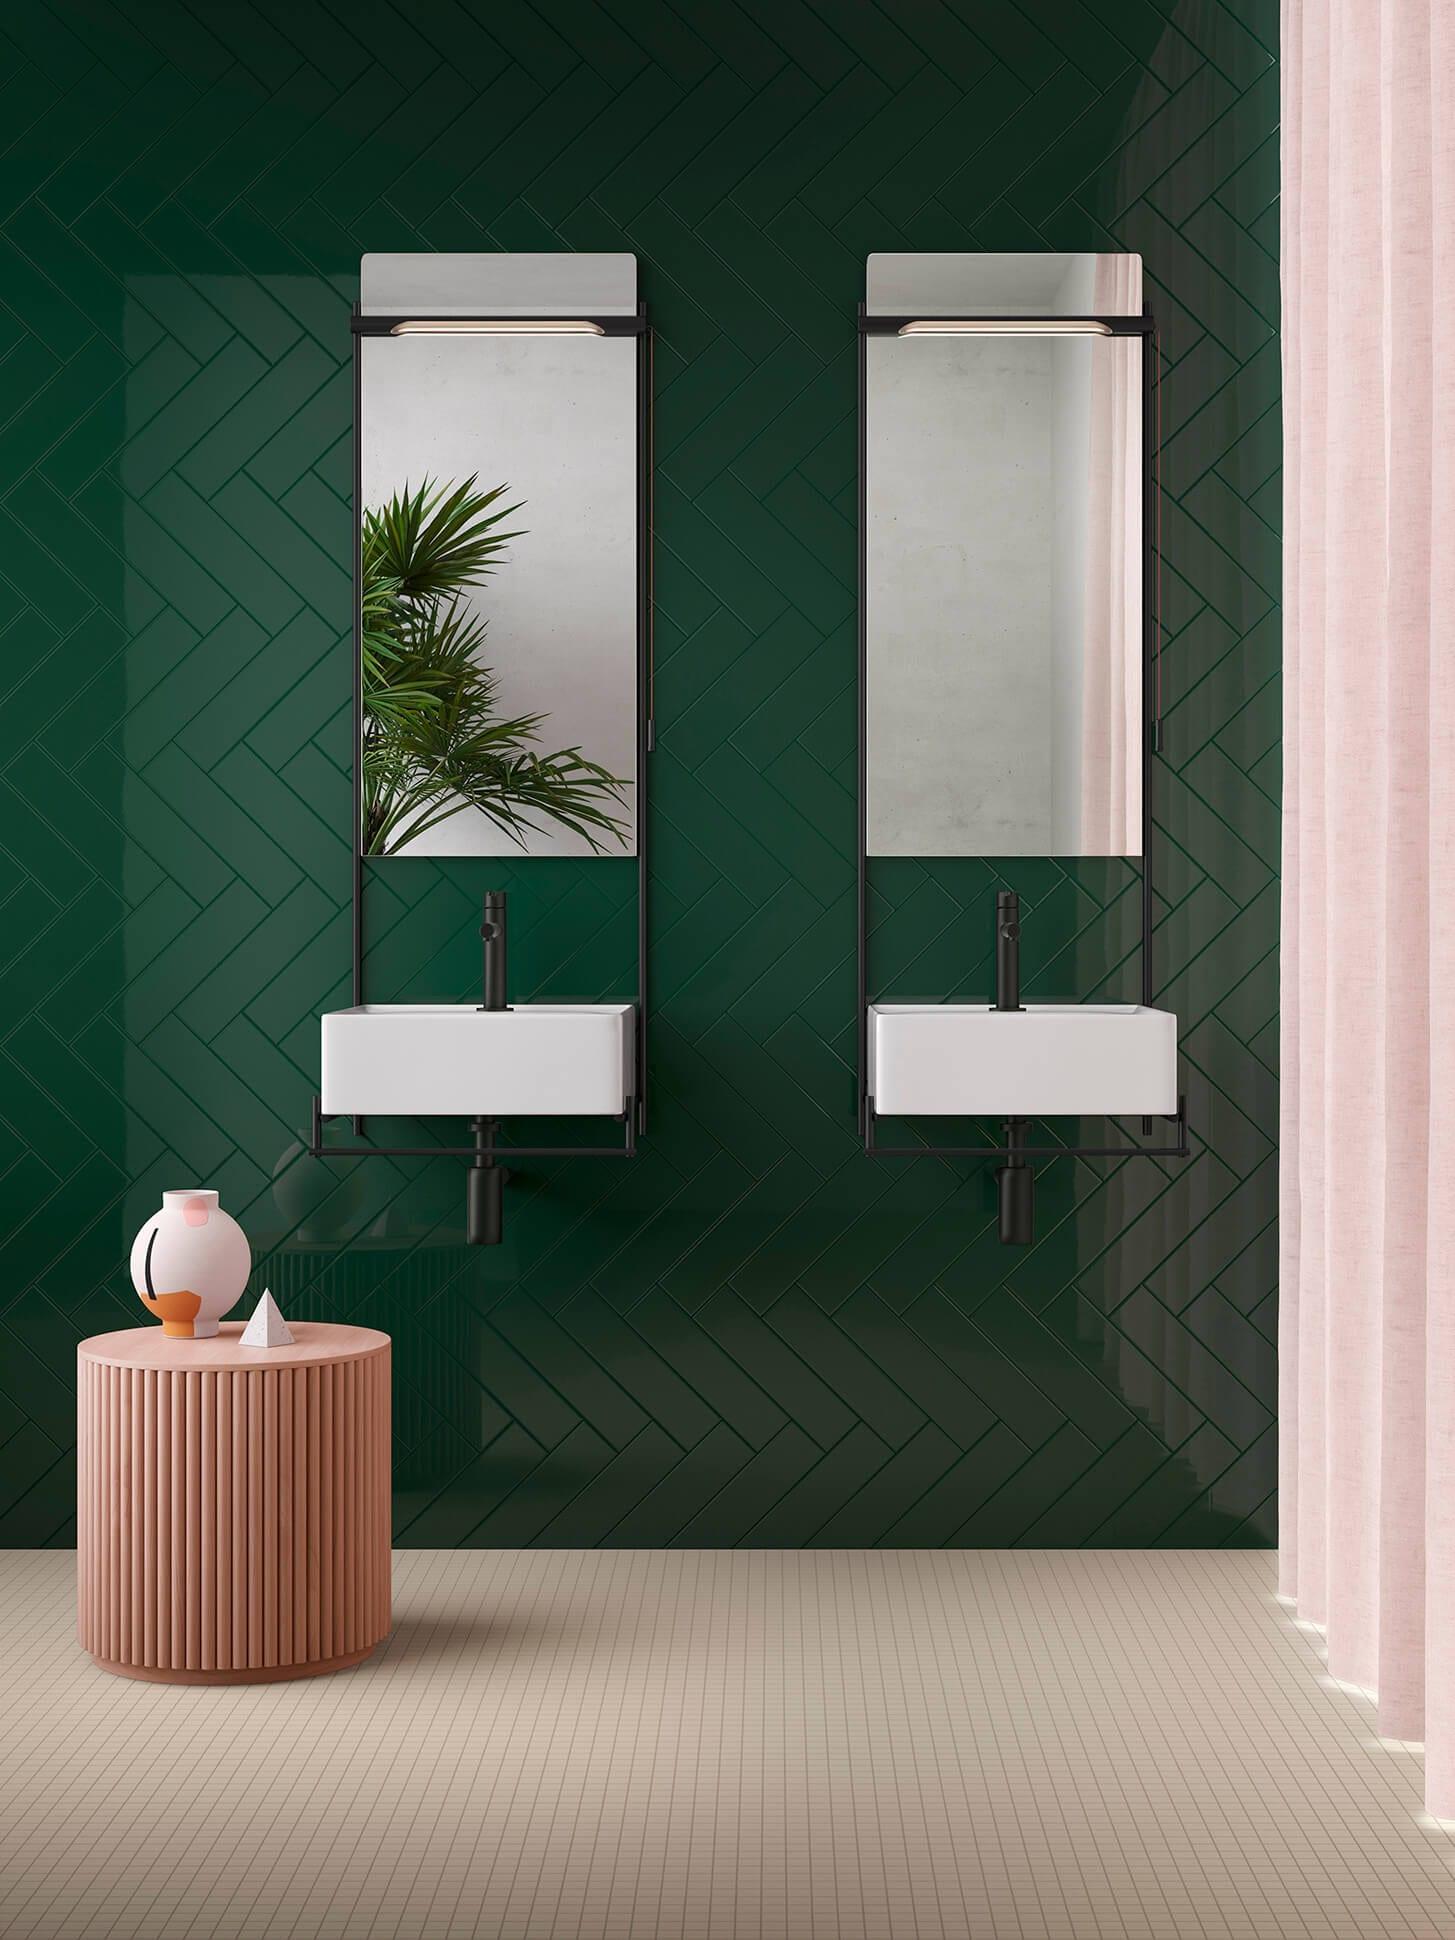 Banyo Seramik Modelleri - Yeşil Seramik